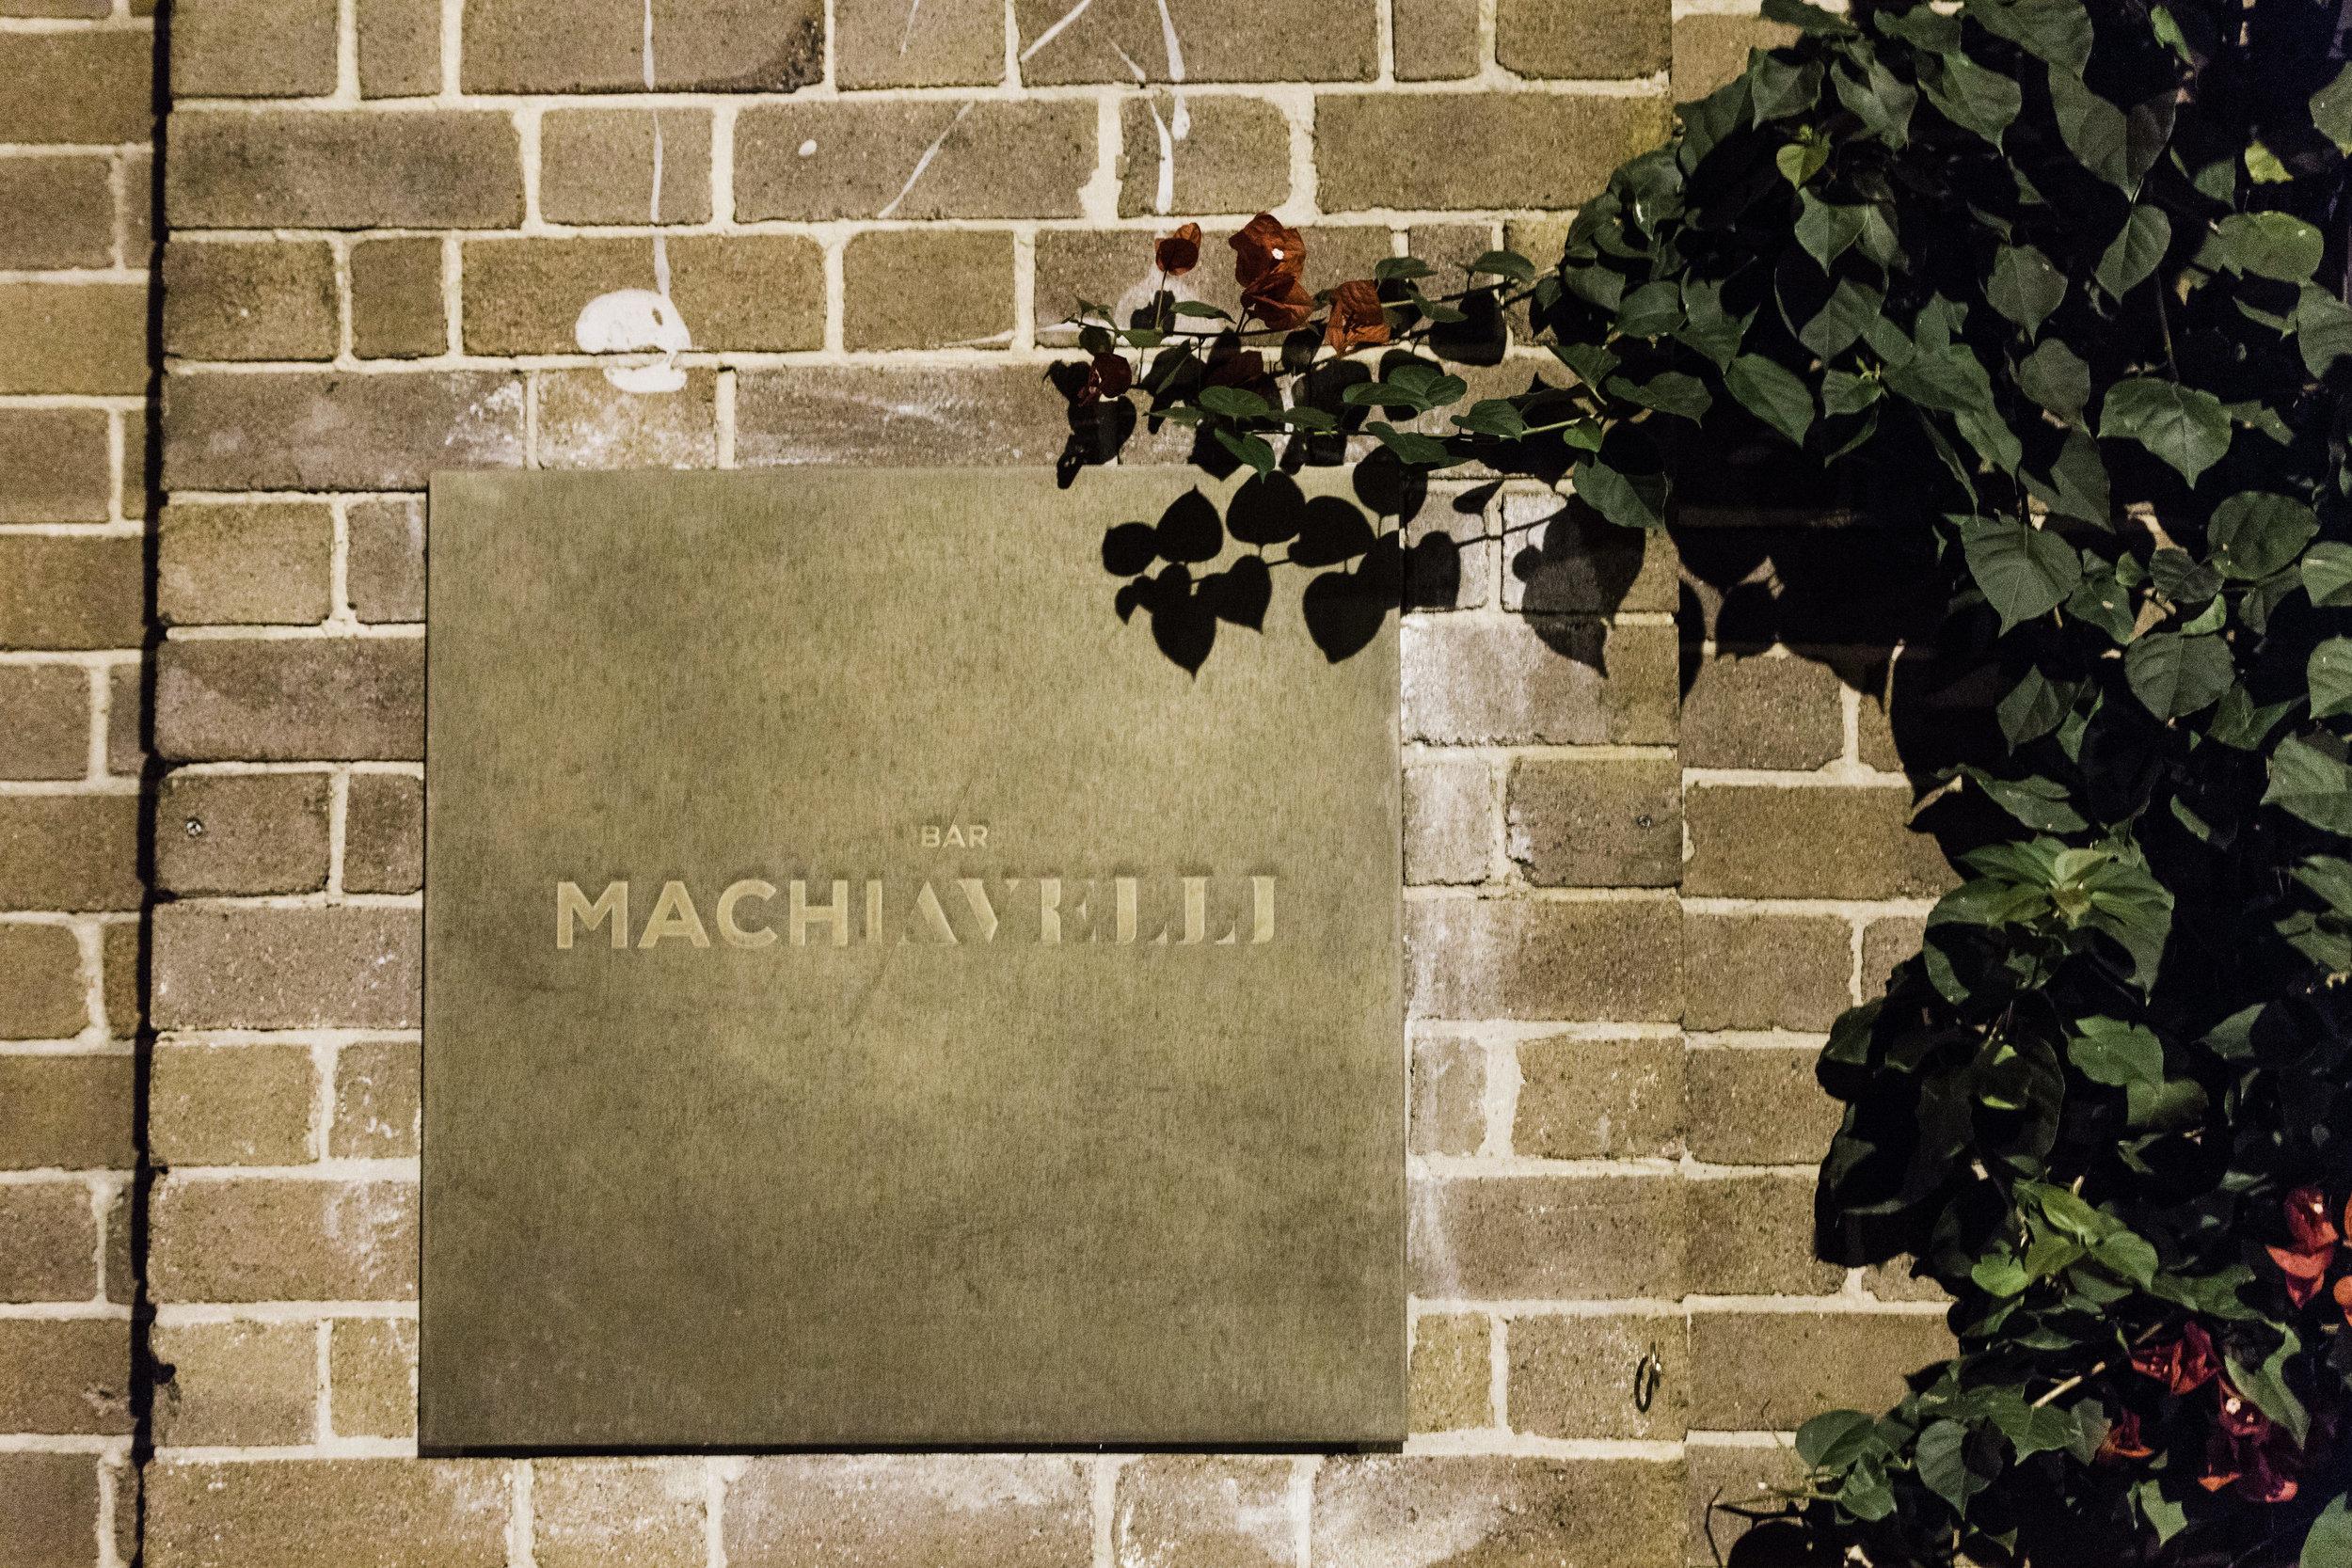 Bar Machiavelli_Sydney_Wedding_Carla_Steve_601.jpg